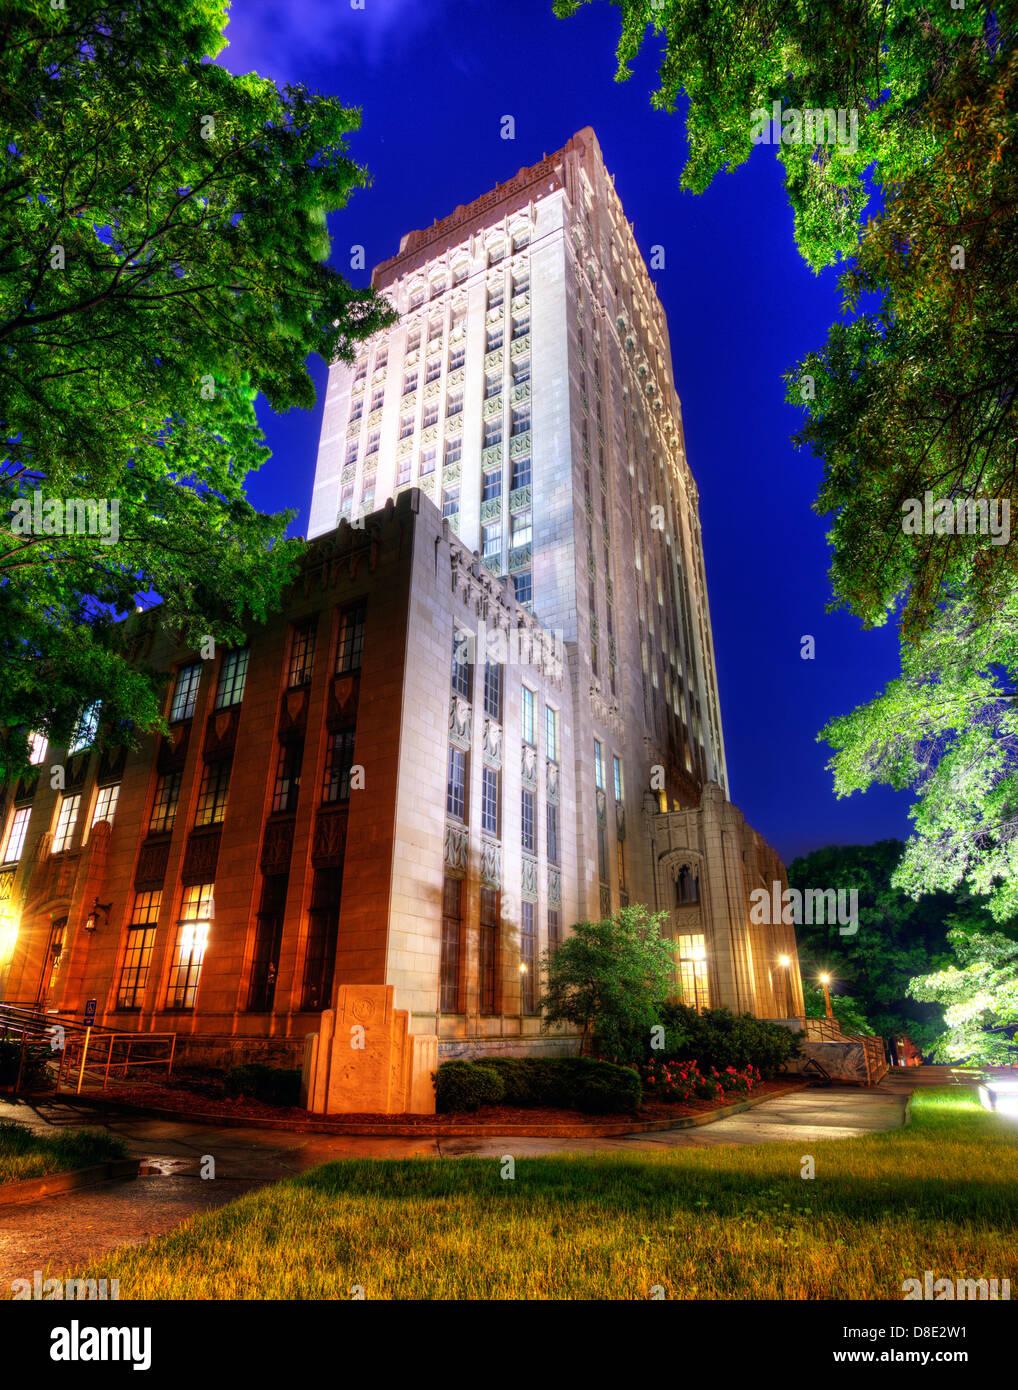 Municipio di Atlanta, Georgia, Stati Uniti d'America. Immagini Stock